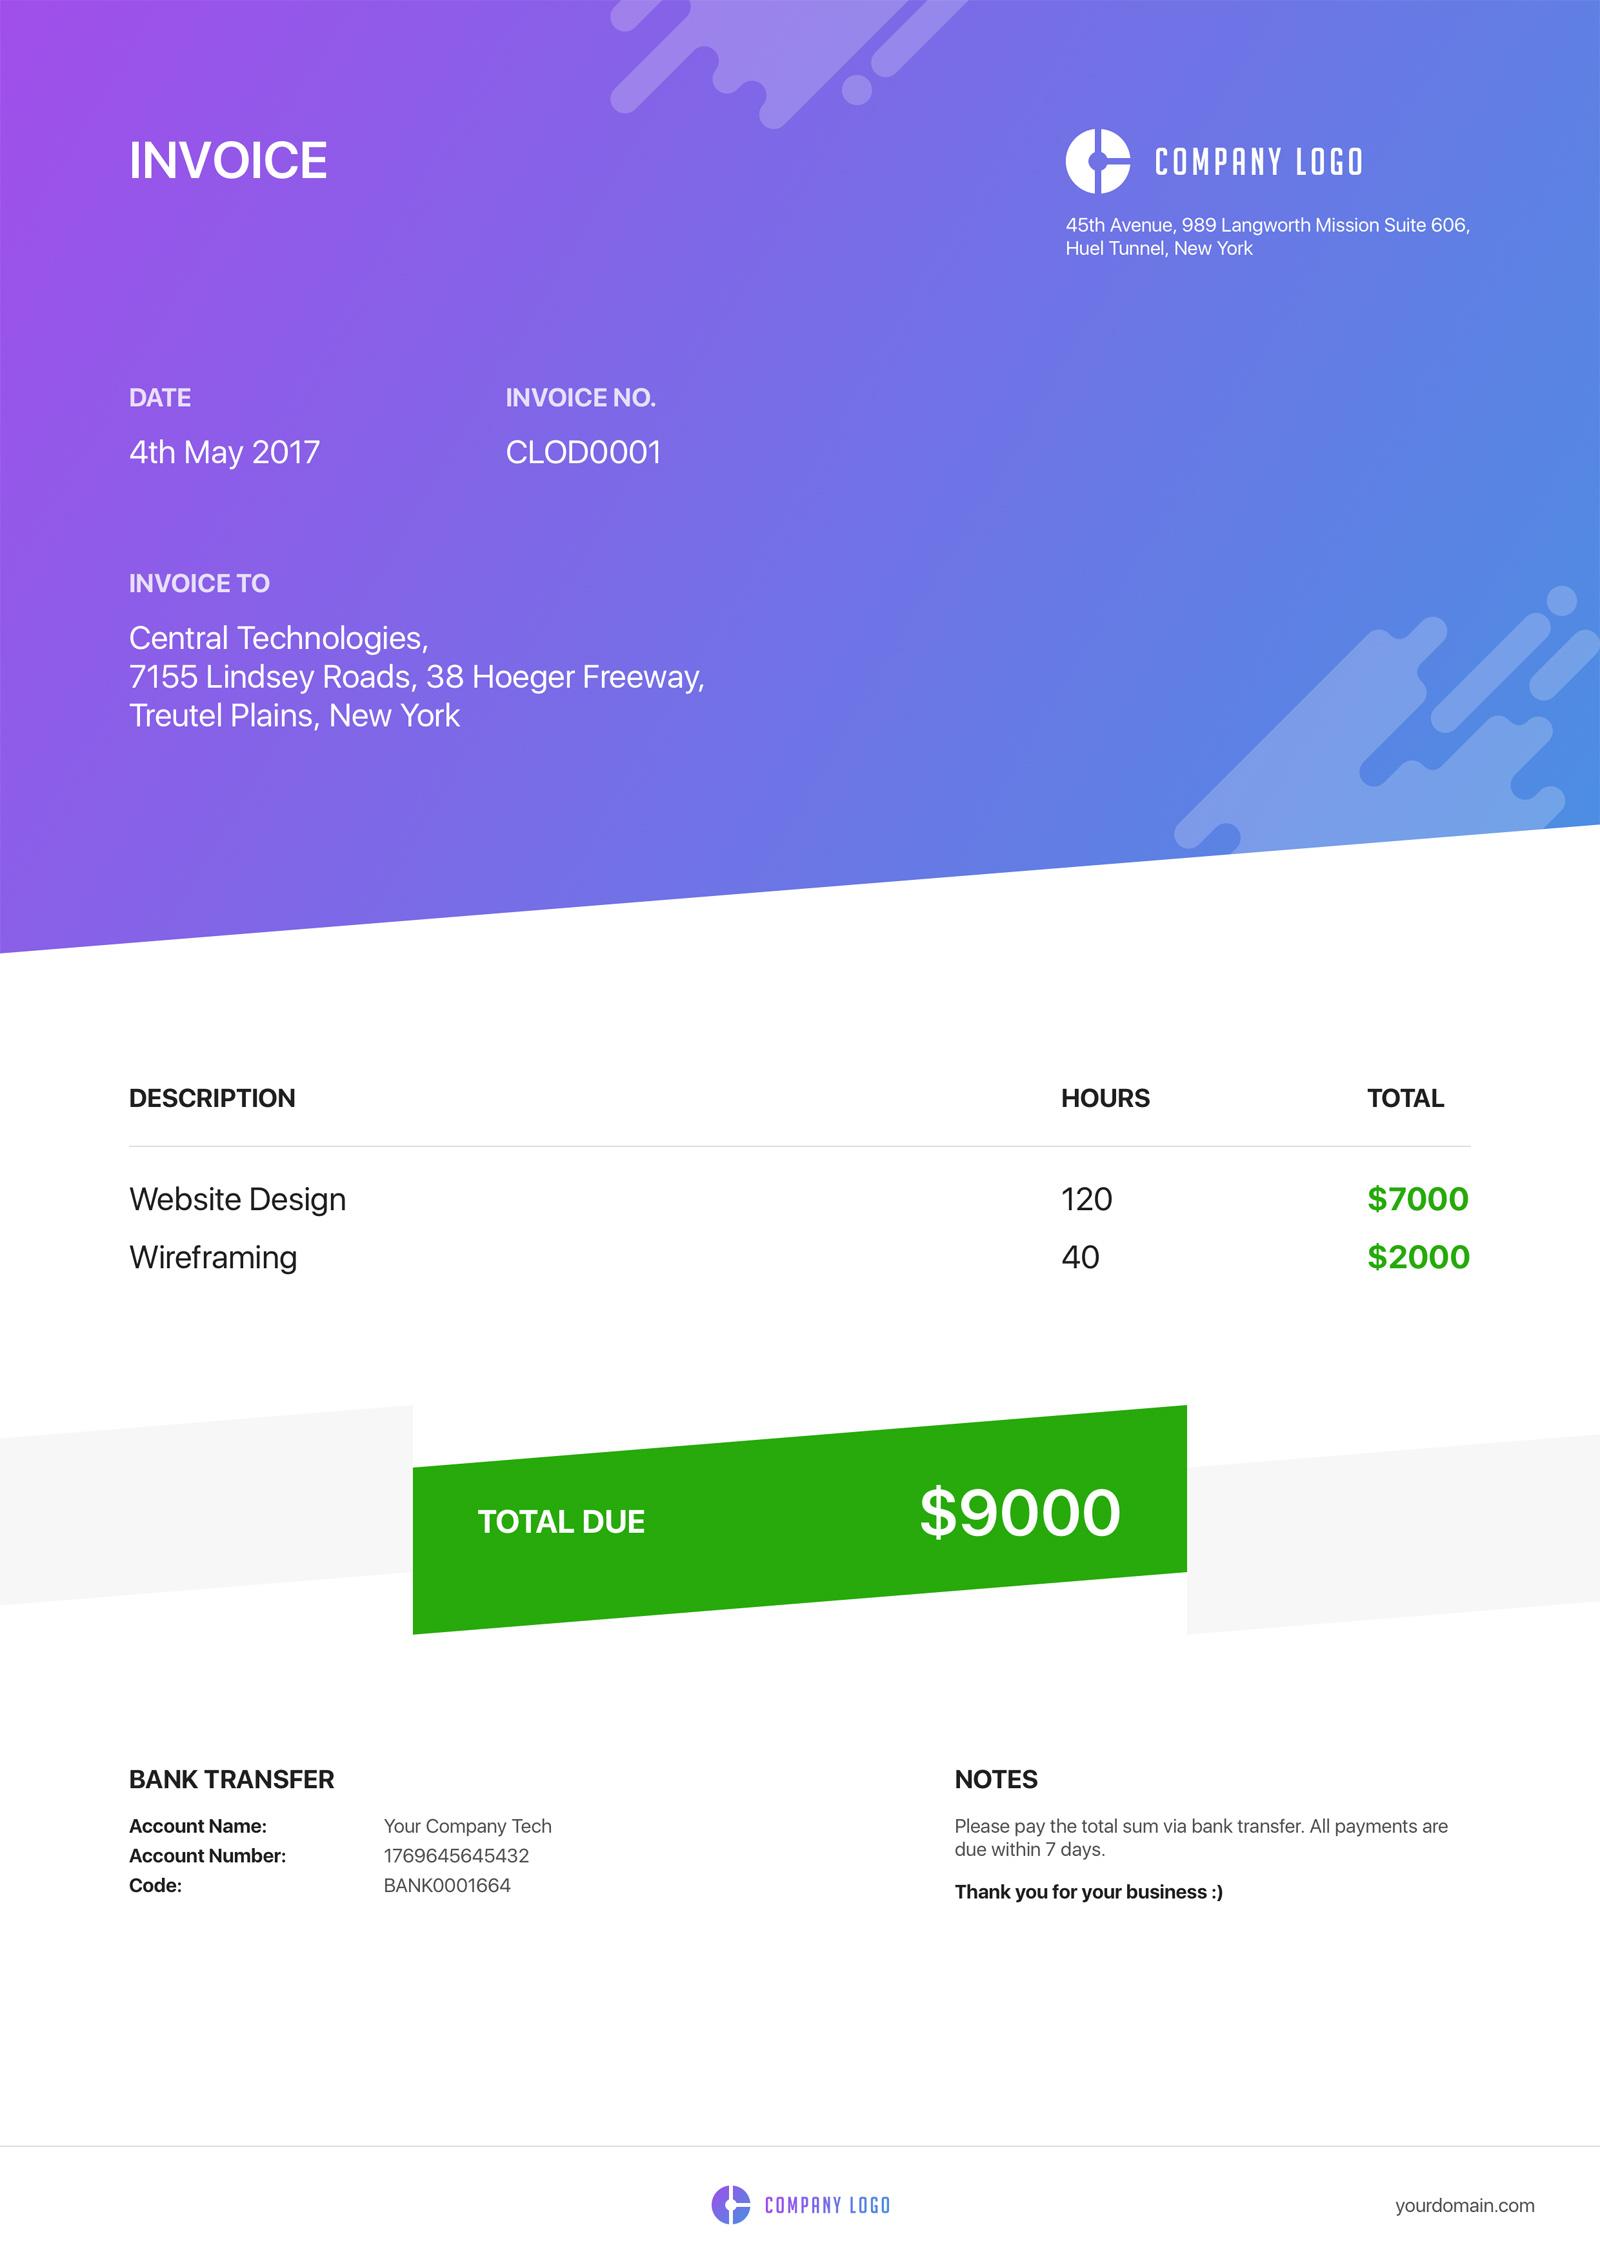 invoice template sketch  Invoice Sketch Template | ApeMockups